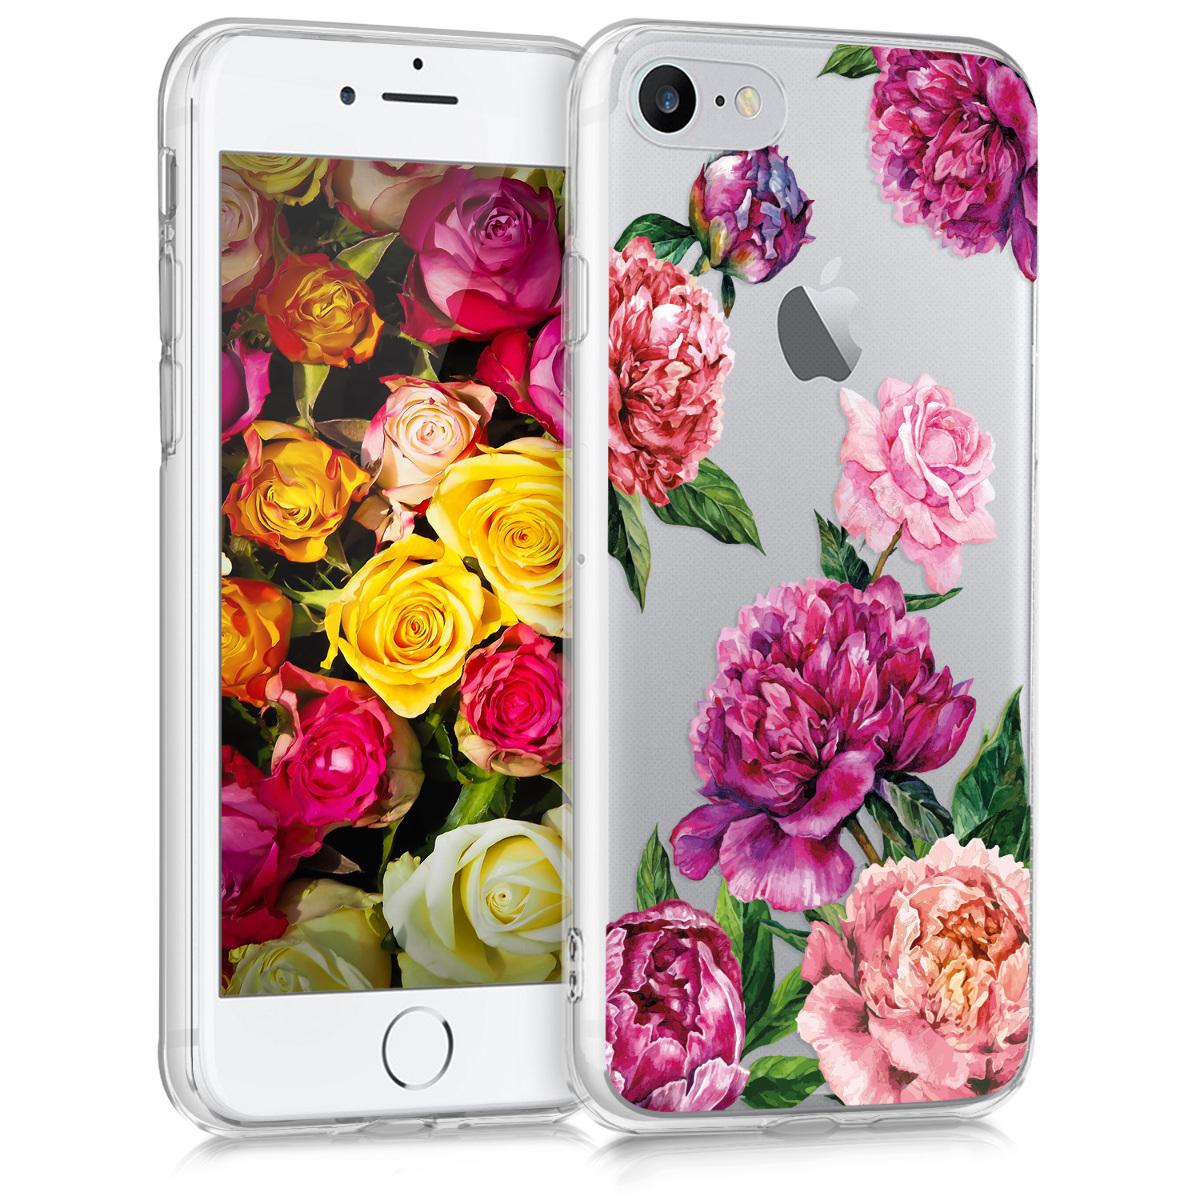 KW Θήκη Σιλικόνης iPhone 7 / 8 - Violet / Light Pink / Transparent (41448.28)